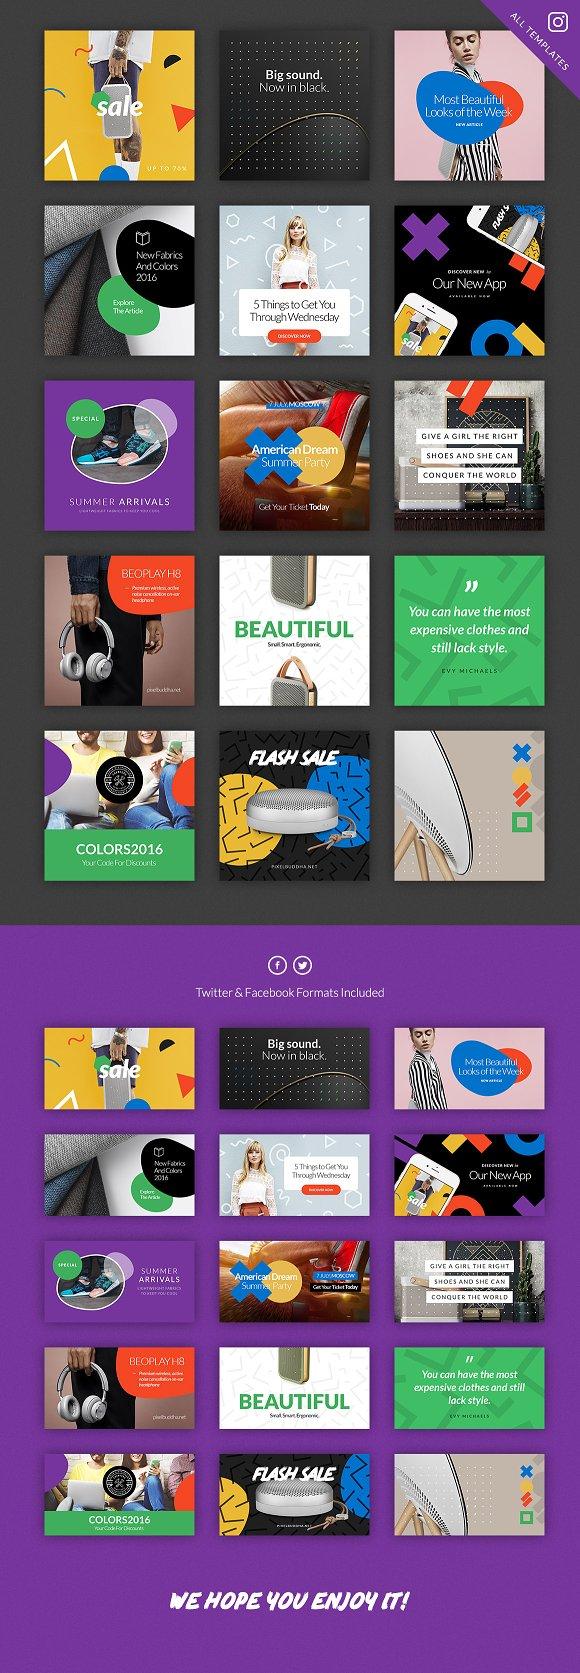 Social Media Booster Kit 2 Instagram Templates Creative Market